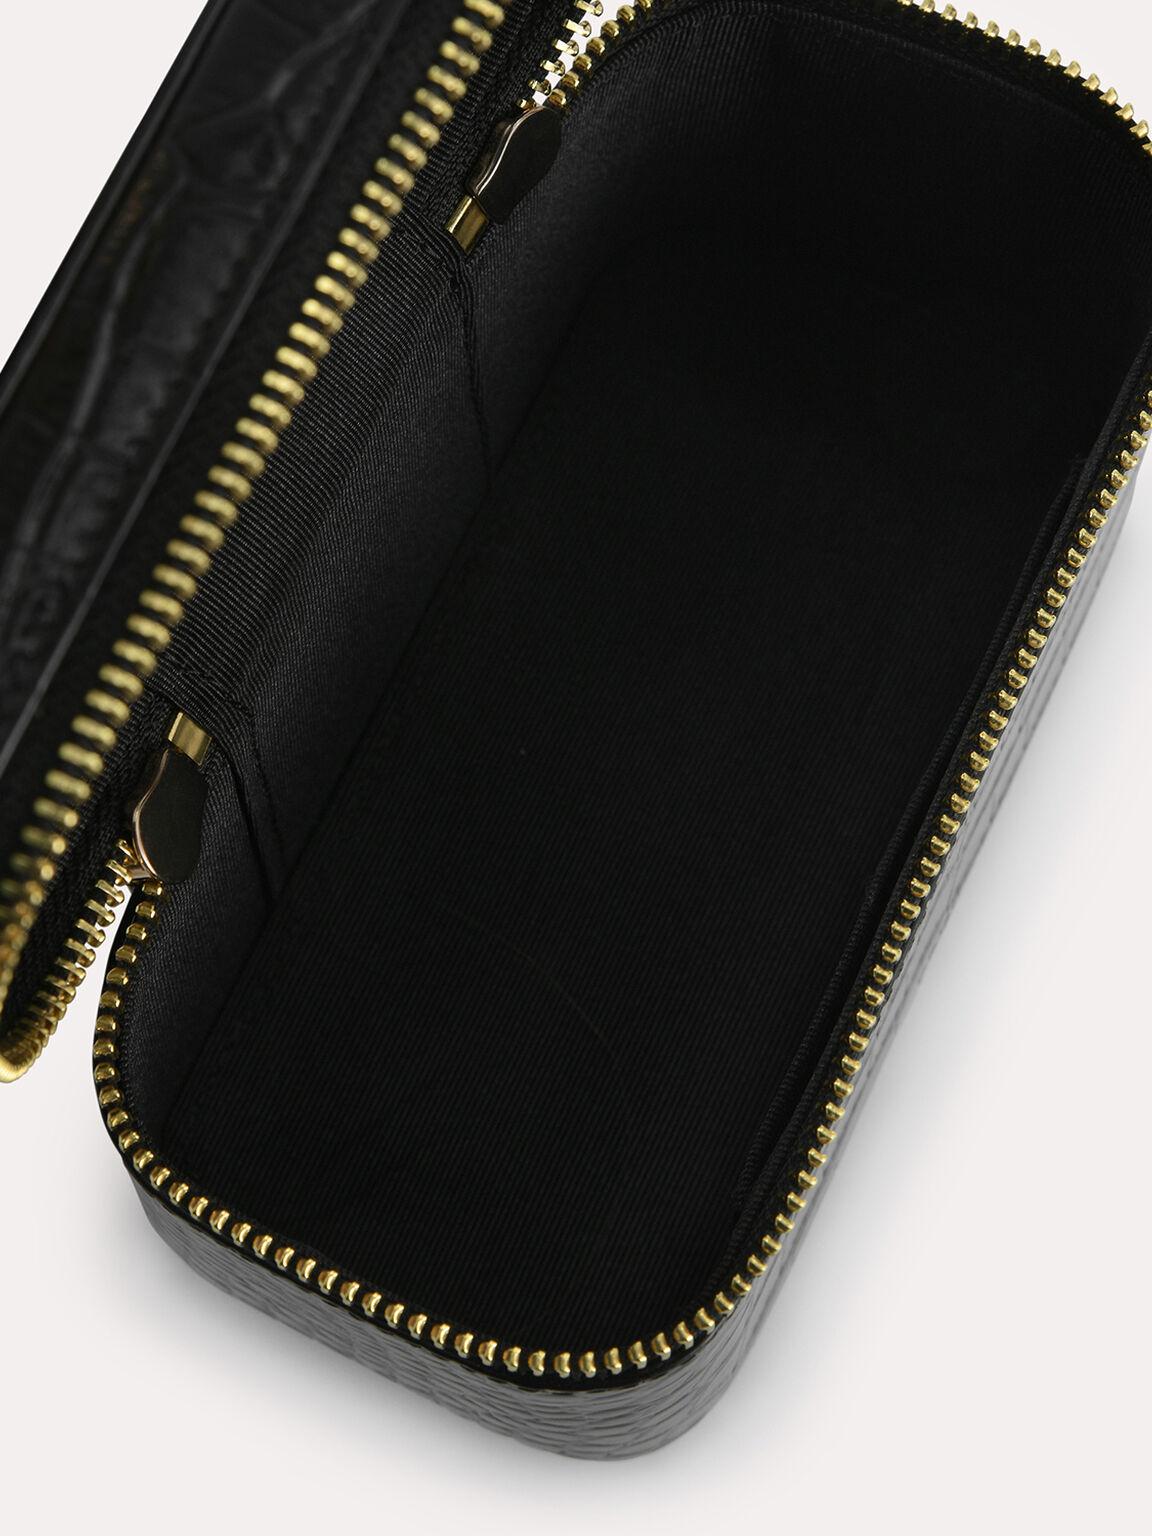 Textured Leather Vanity Case, Black, hi-res